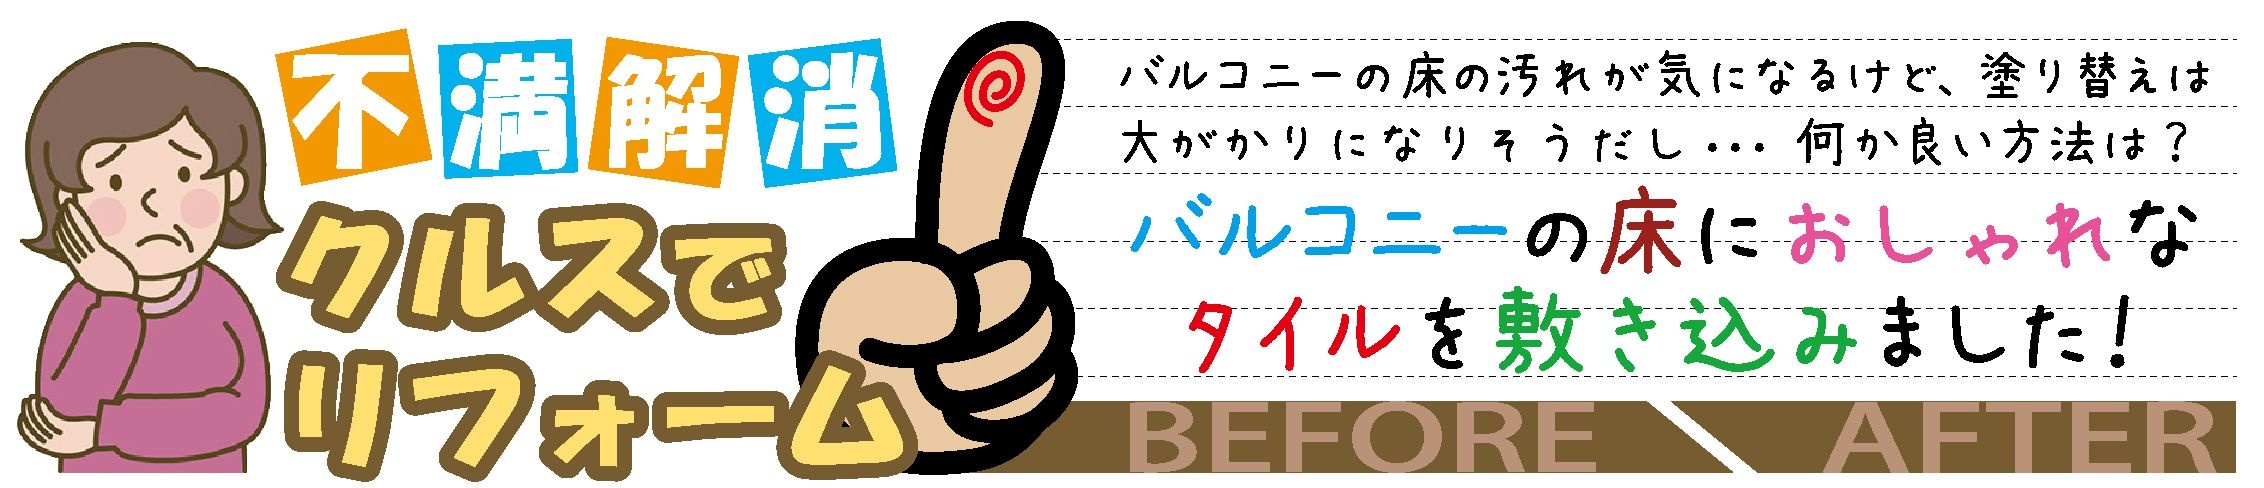 KuraSi-natu-sin103-08.jpg